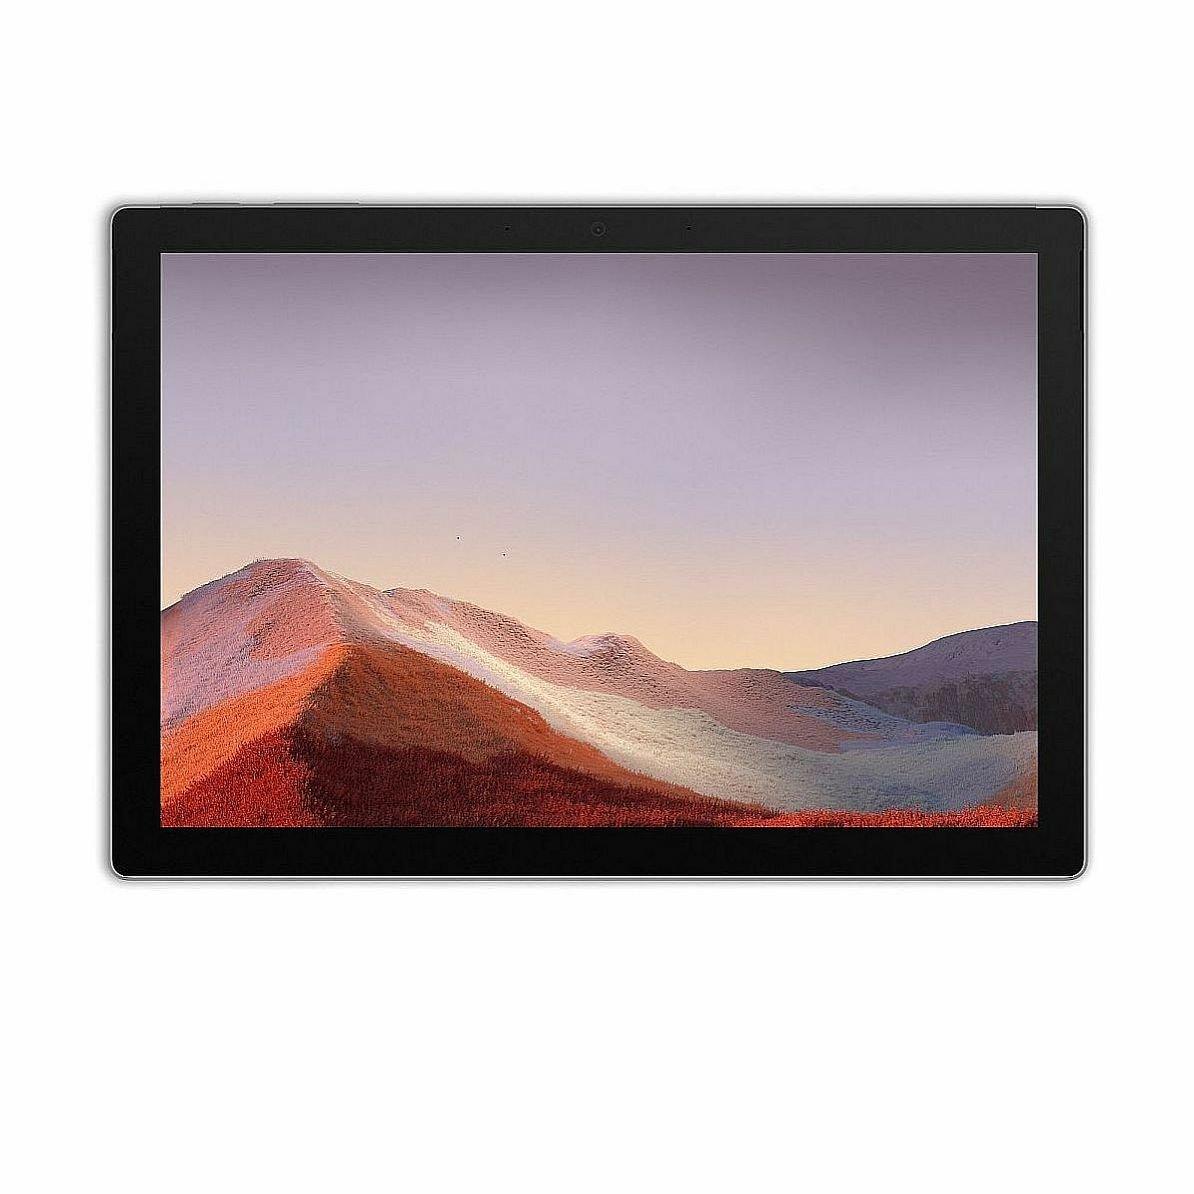 Microsoft Surface Pro 7 i7 16GB 256GB 2-in-1 Laptop Platinum